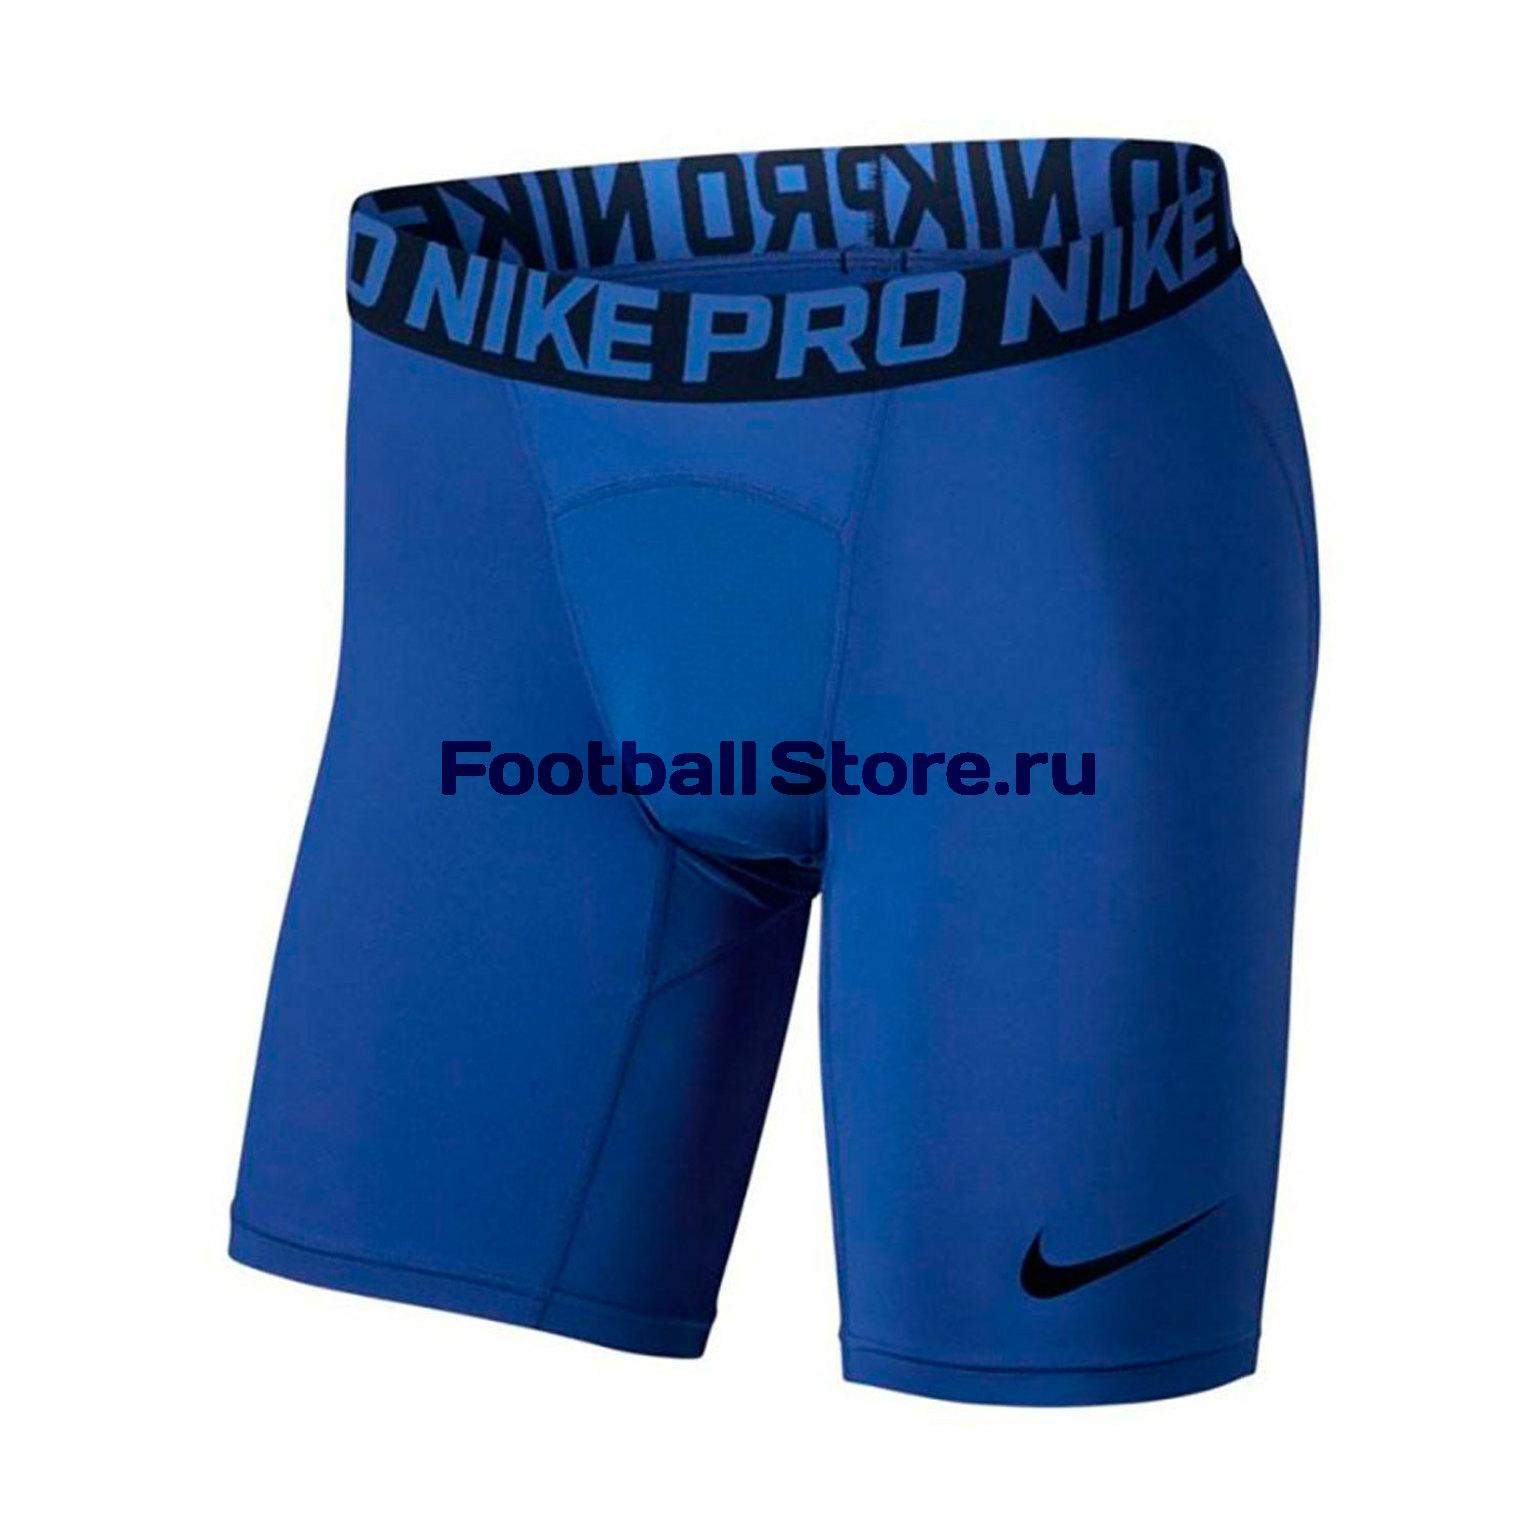 Белье шорты Nike NP Short 838061-480 нижнее белье nike 654876 341 pro combat